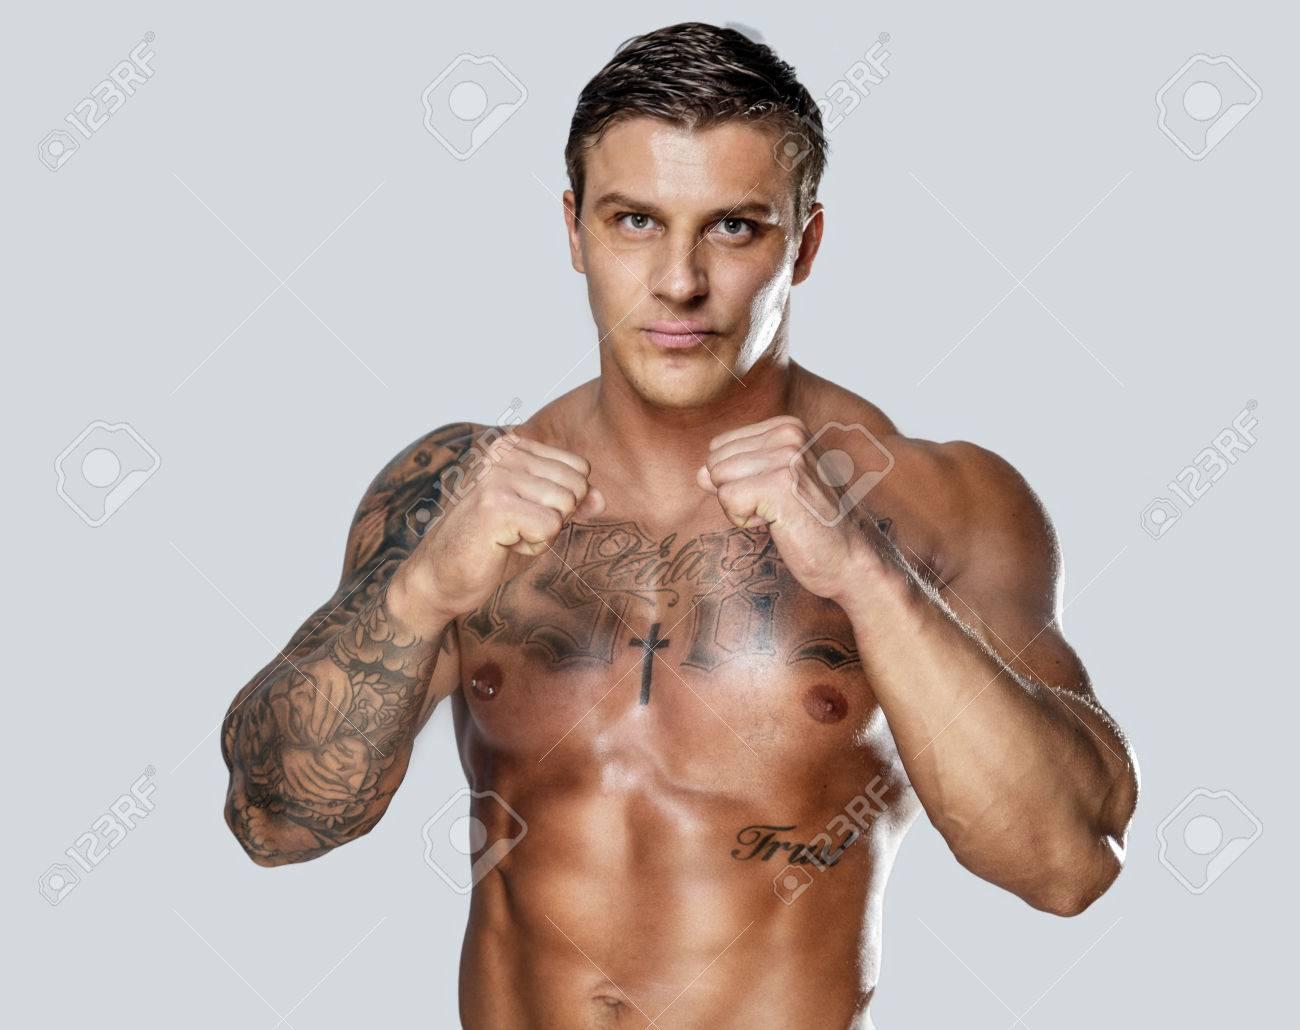 Man with body tattos posing on grey background. Studio shoot. - 40247071